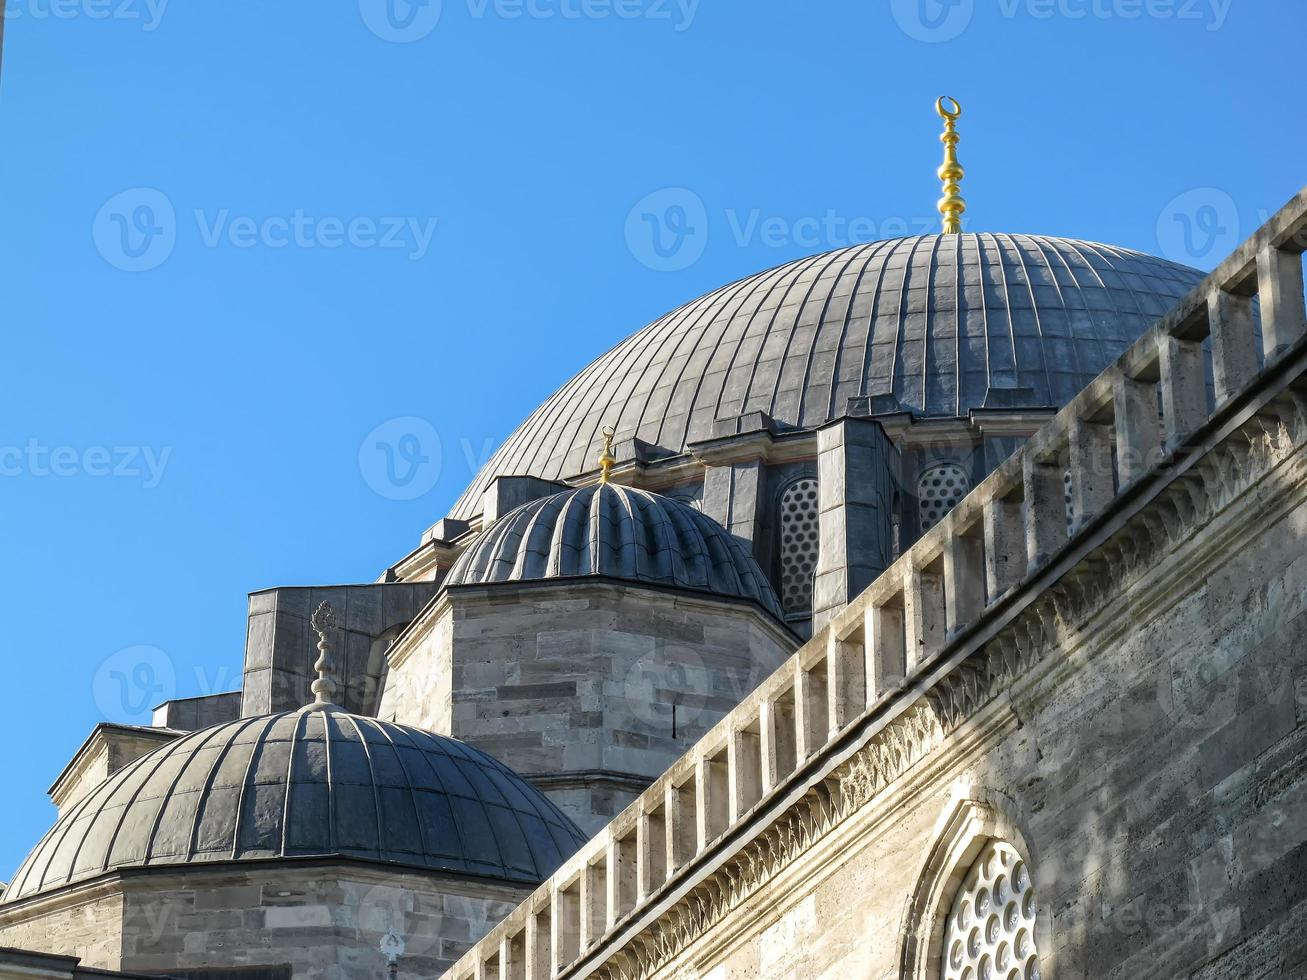 Detalles de la arquitectura de la mezquita de Süleymaniye, Estambul foto